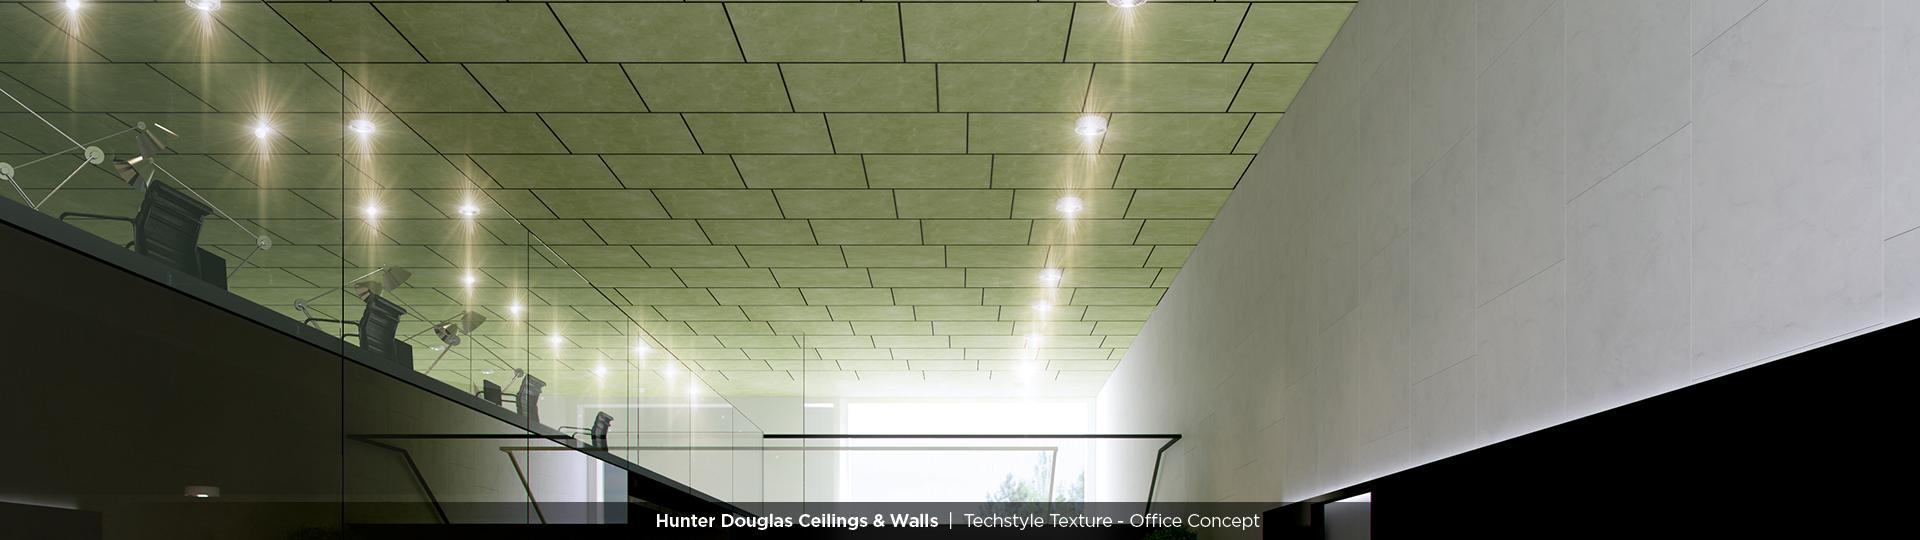 Techstyle Texture   Hunter Douglas Ceilings & Walls   CertainTeed